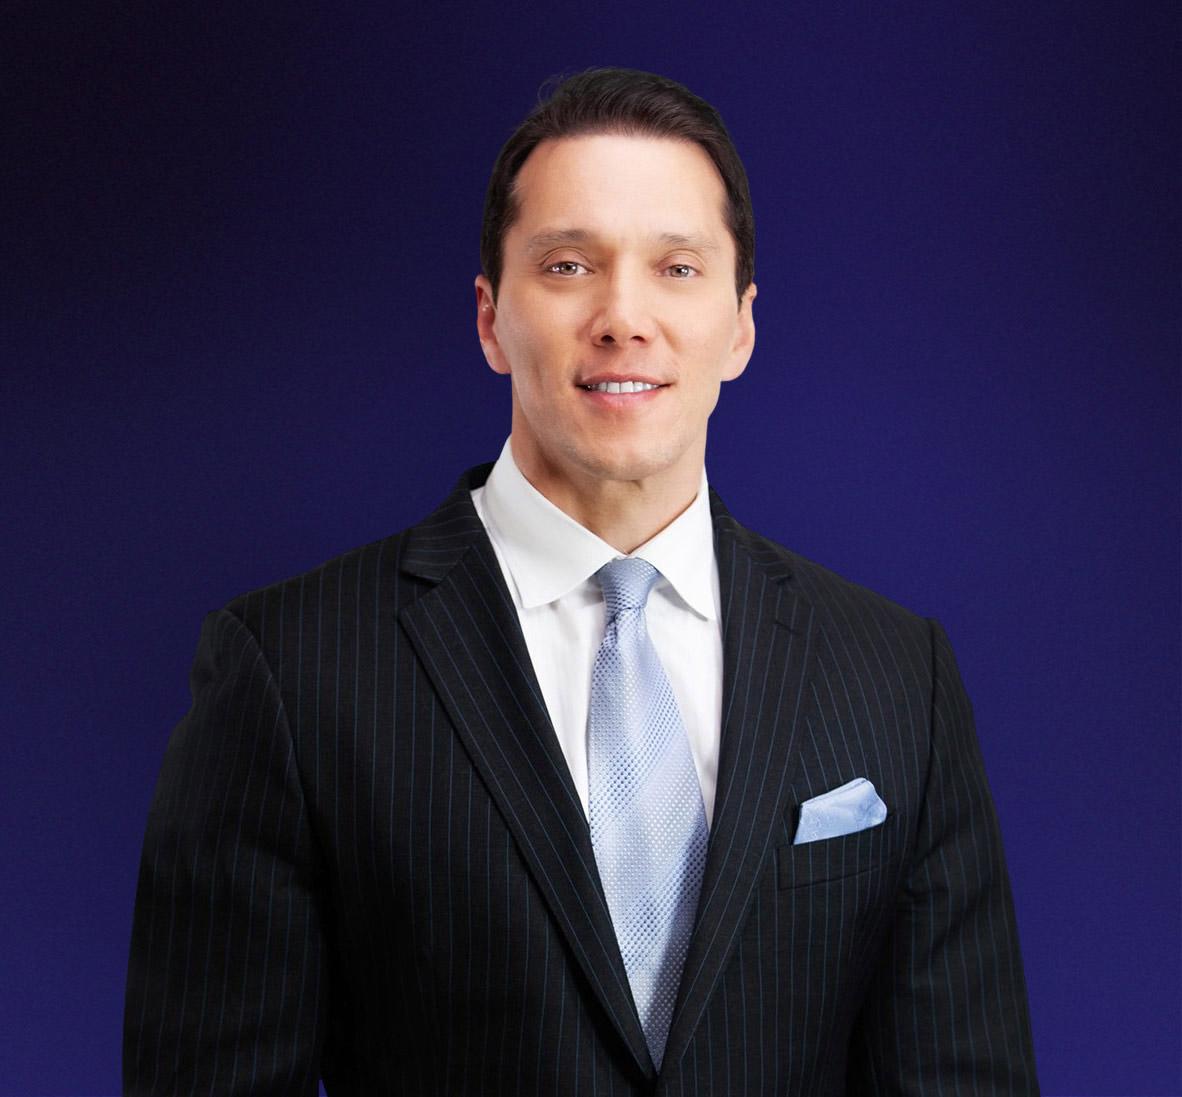 Steven J. Cyr, M.D. - Mobile